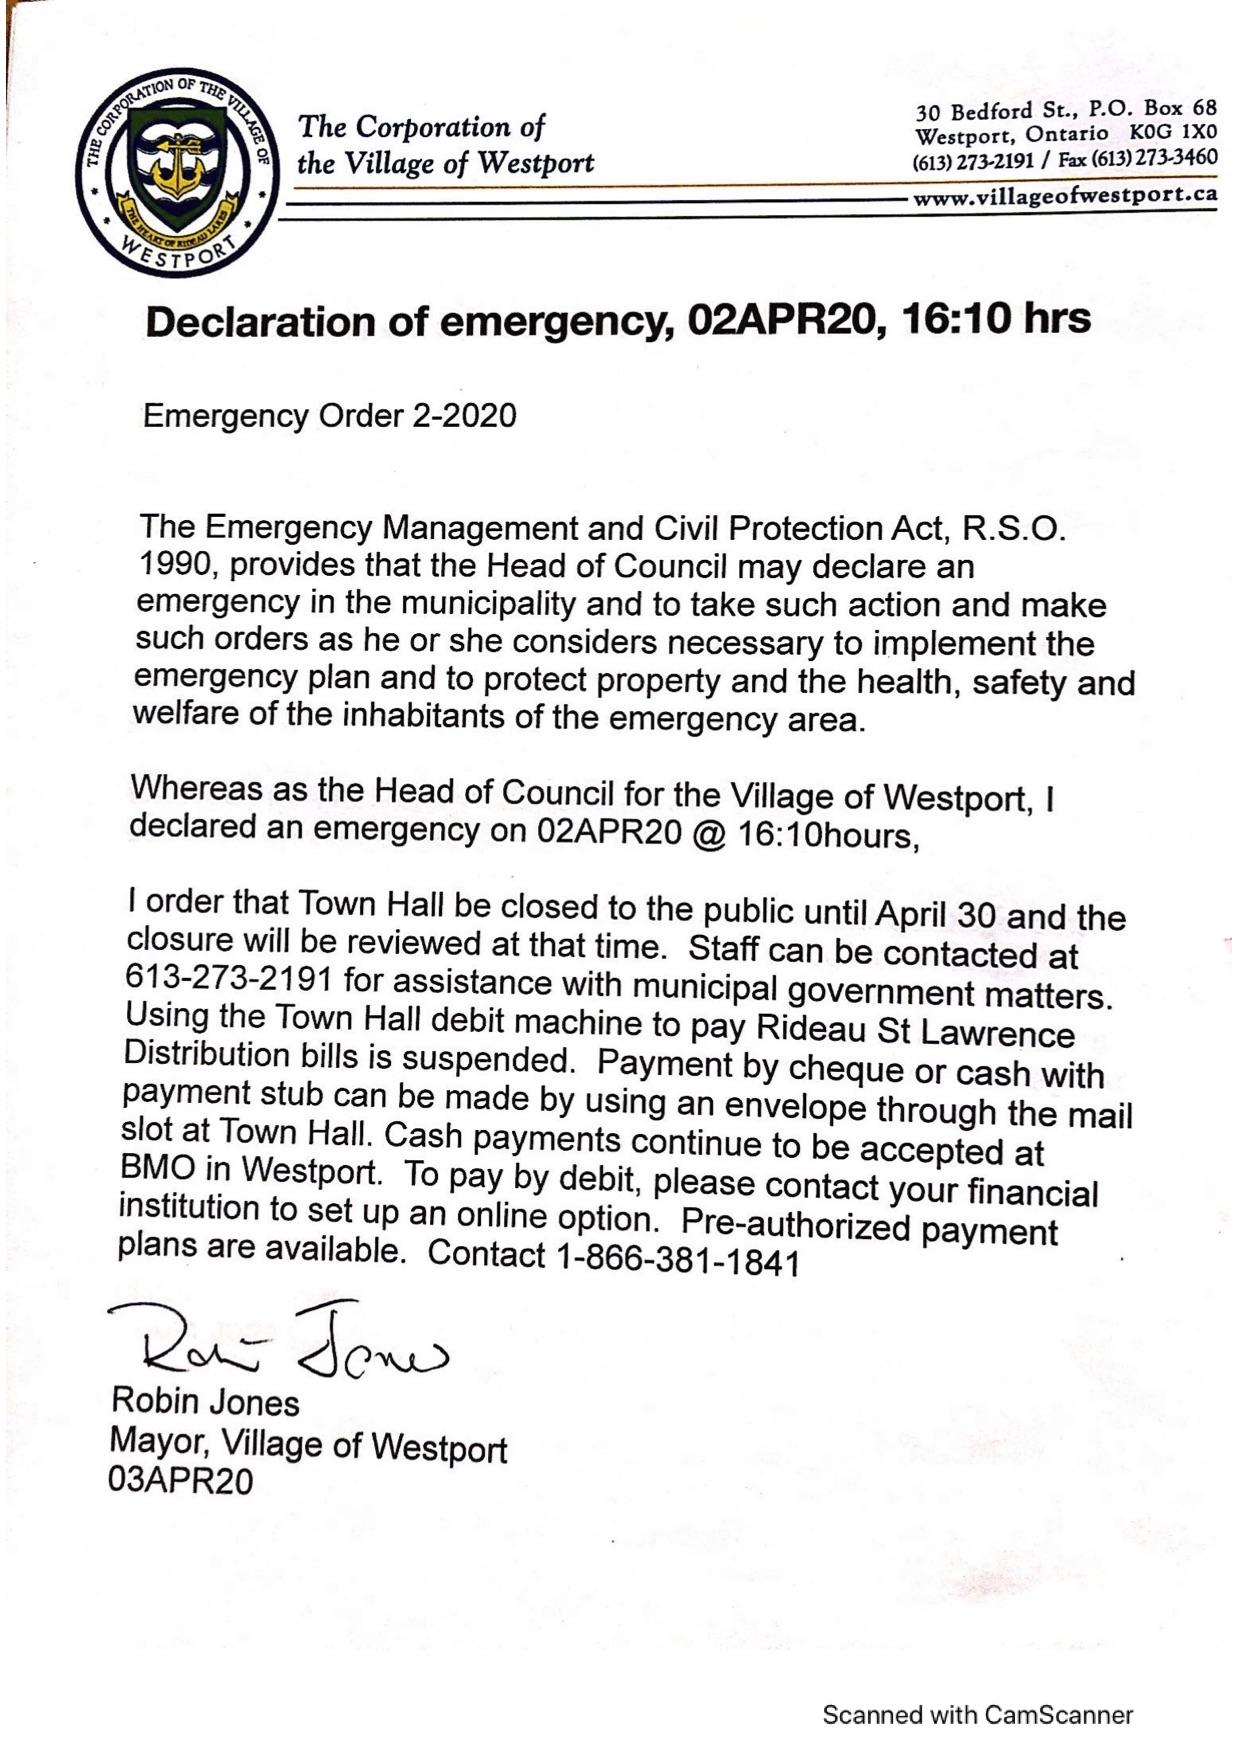 emergency order #2